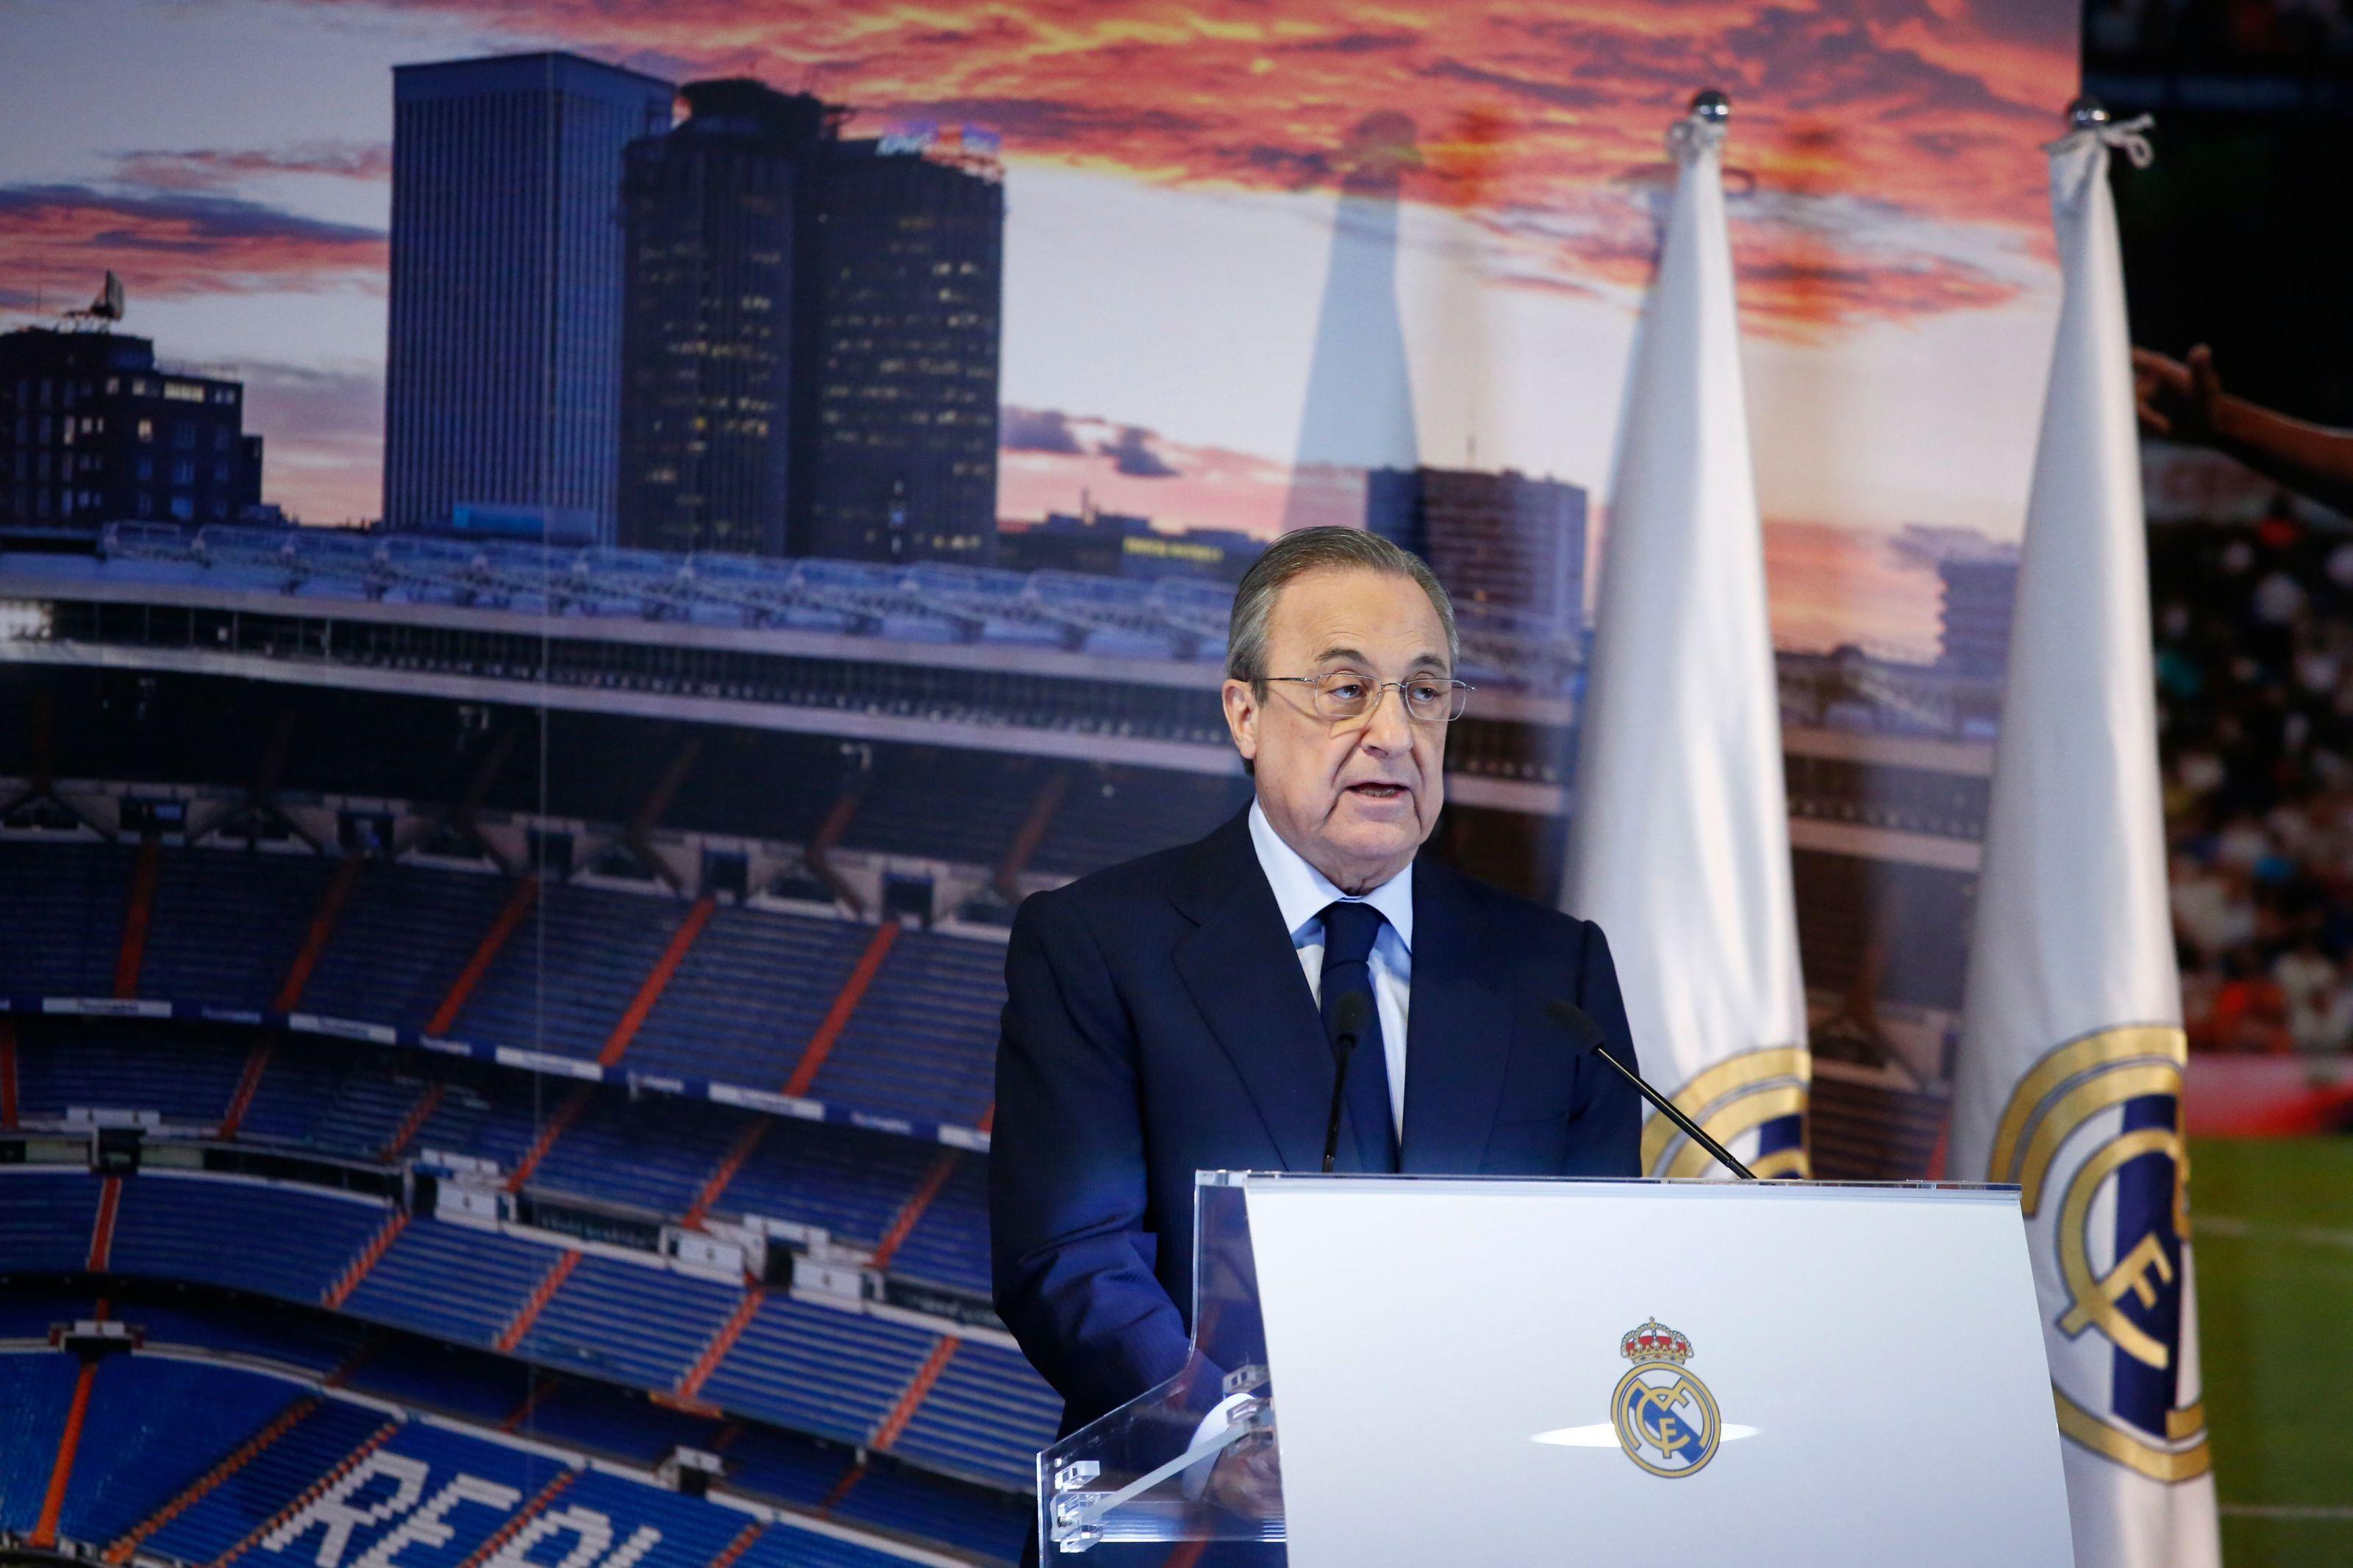 Real Madrid: Florentino Perez denies Zinedine Zidane's requested player signing